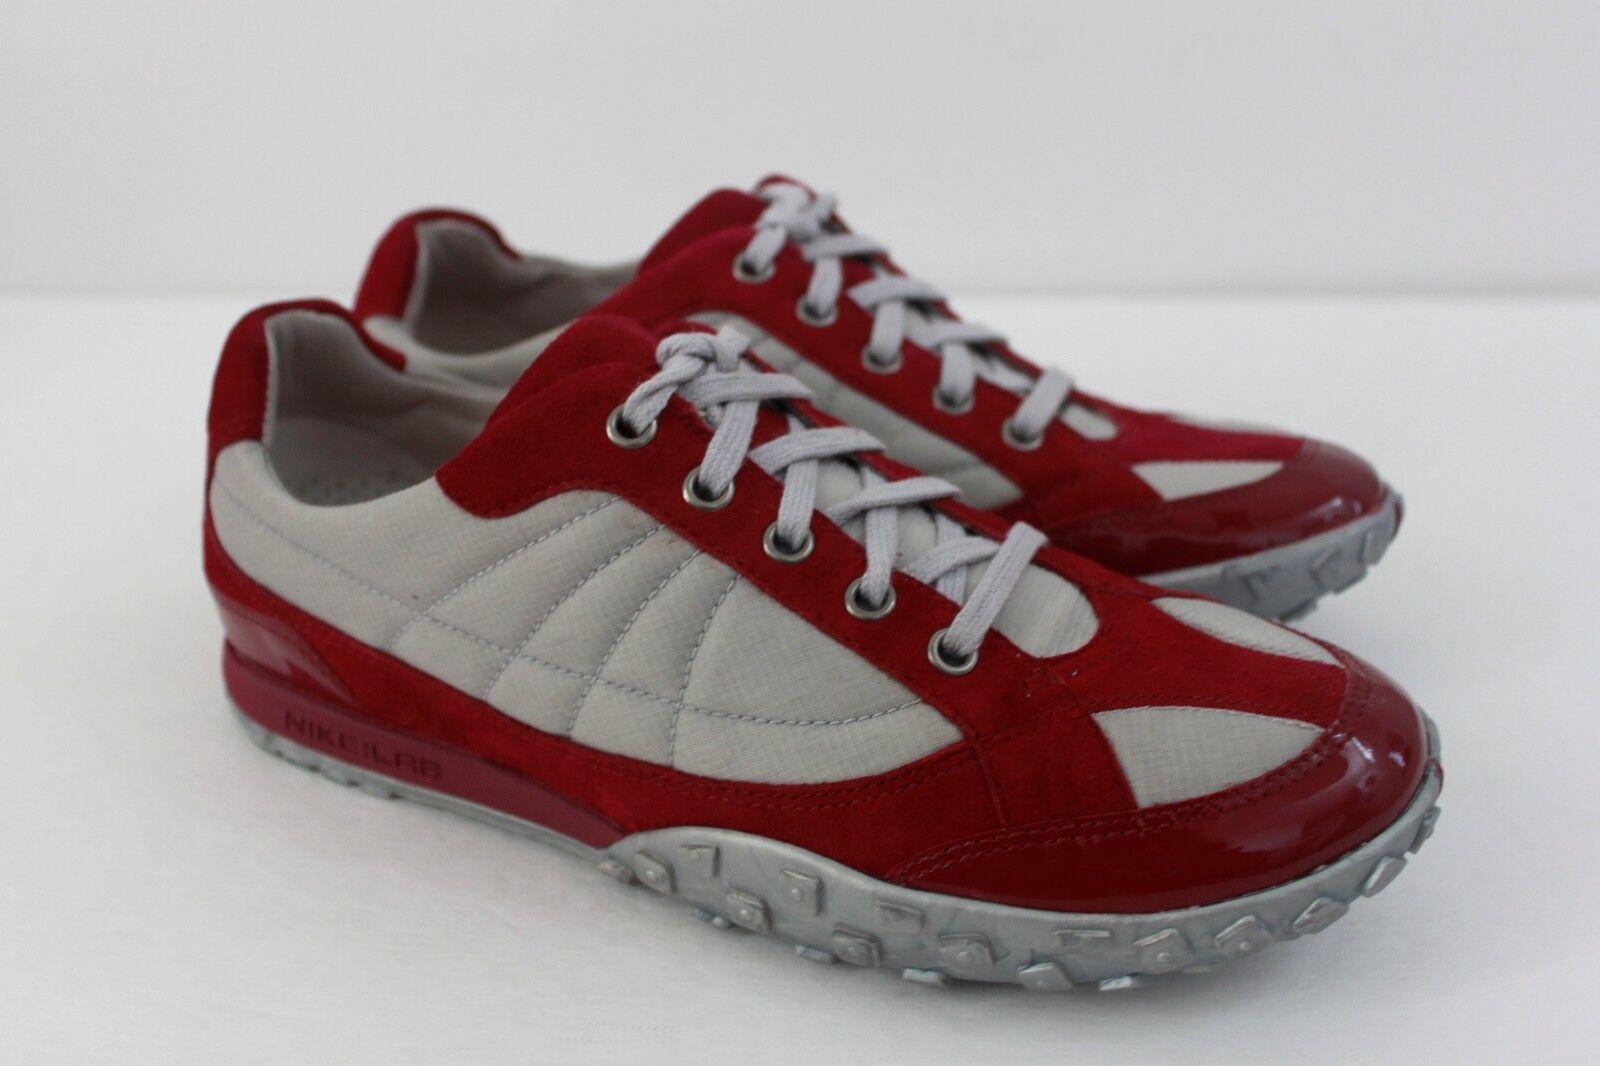 Cole Haan Damenschuhe Sneakers Schuhes Größe 7 M ROT Nylon Suede Patent Leder NIB